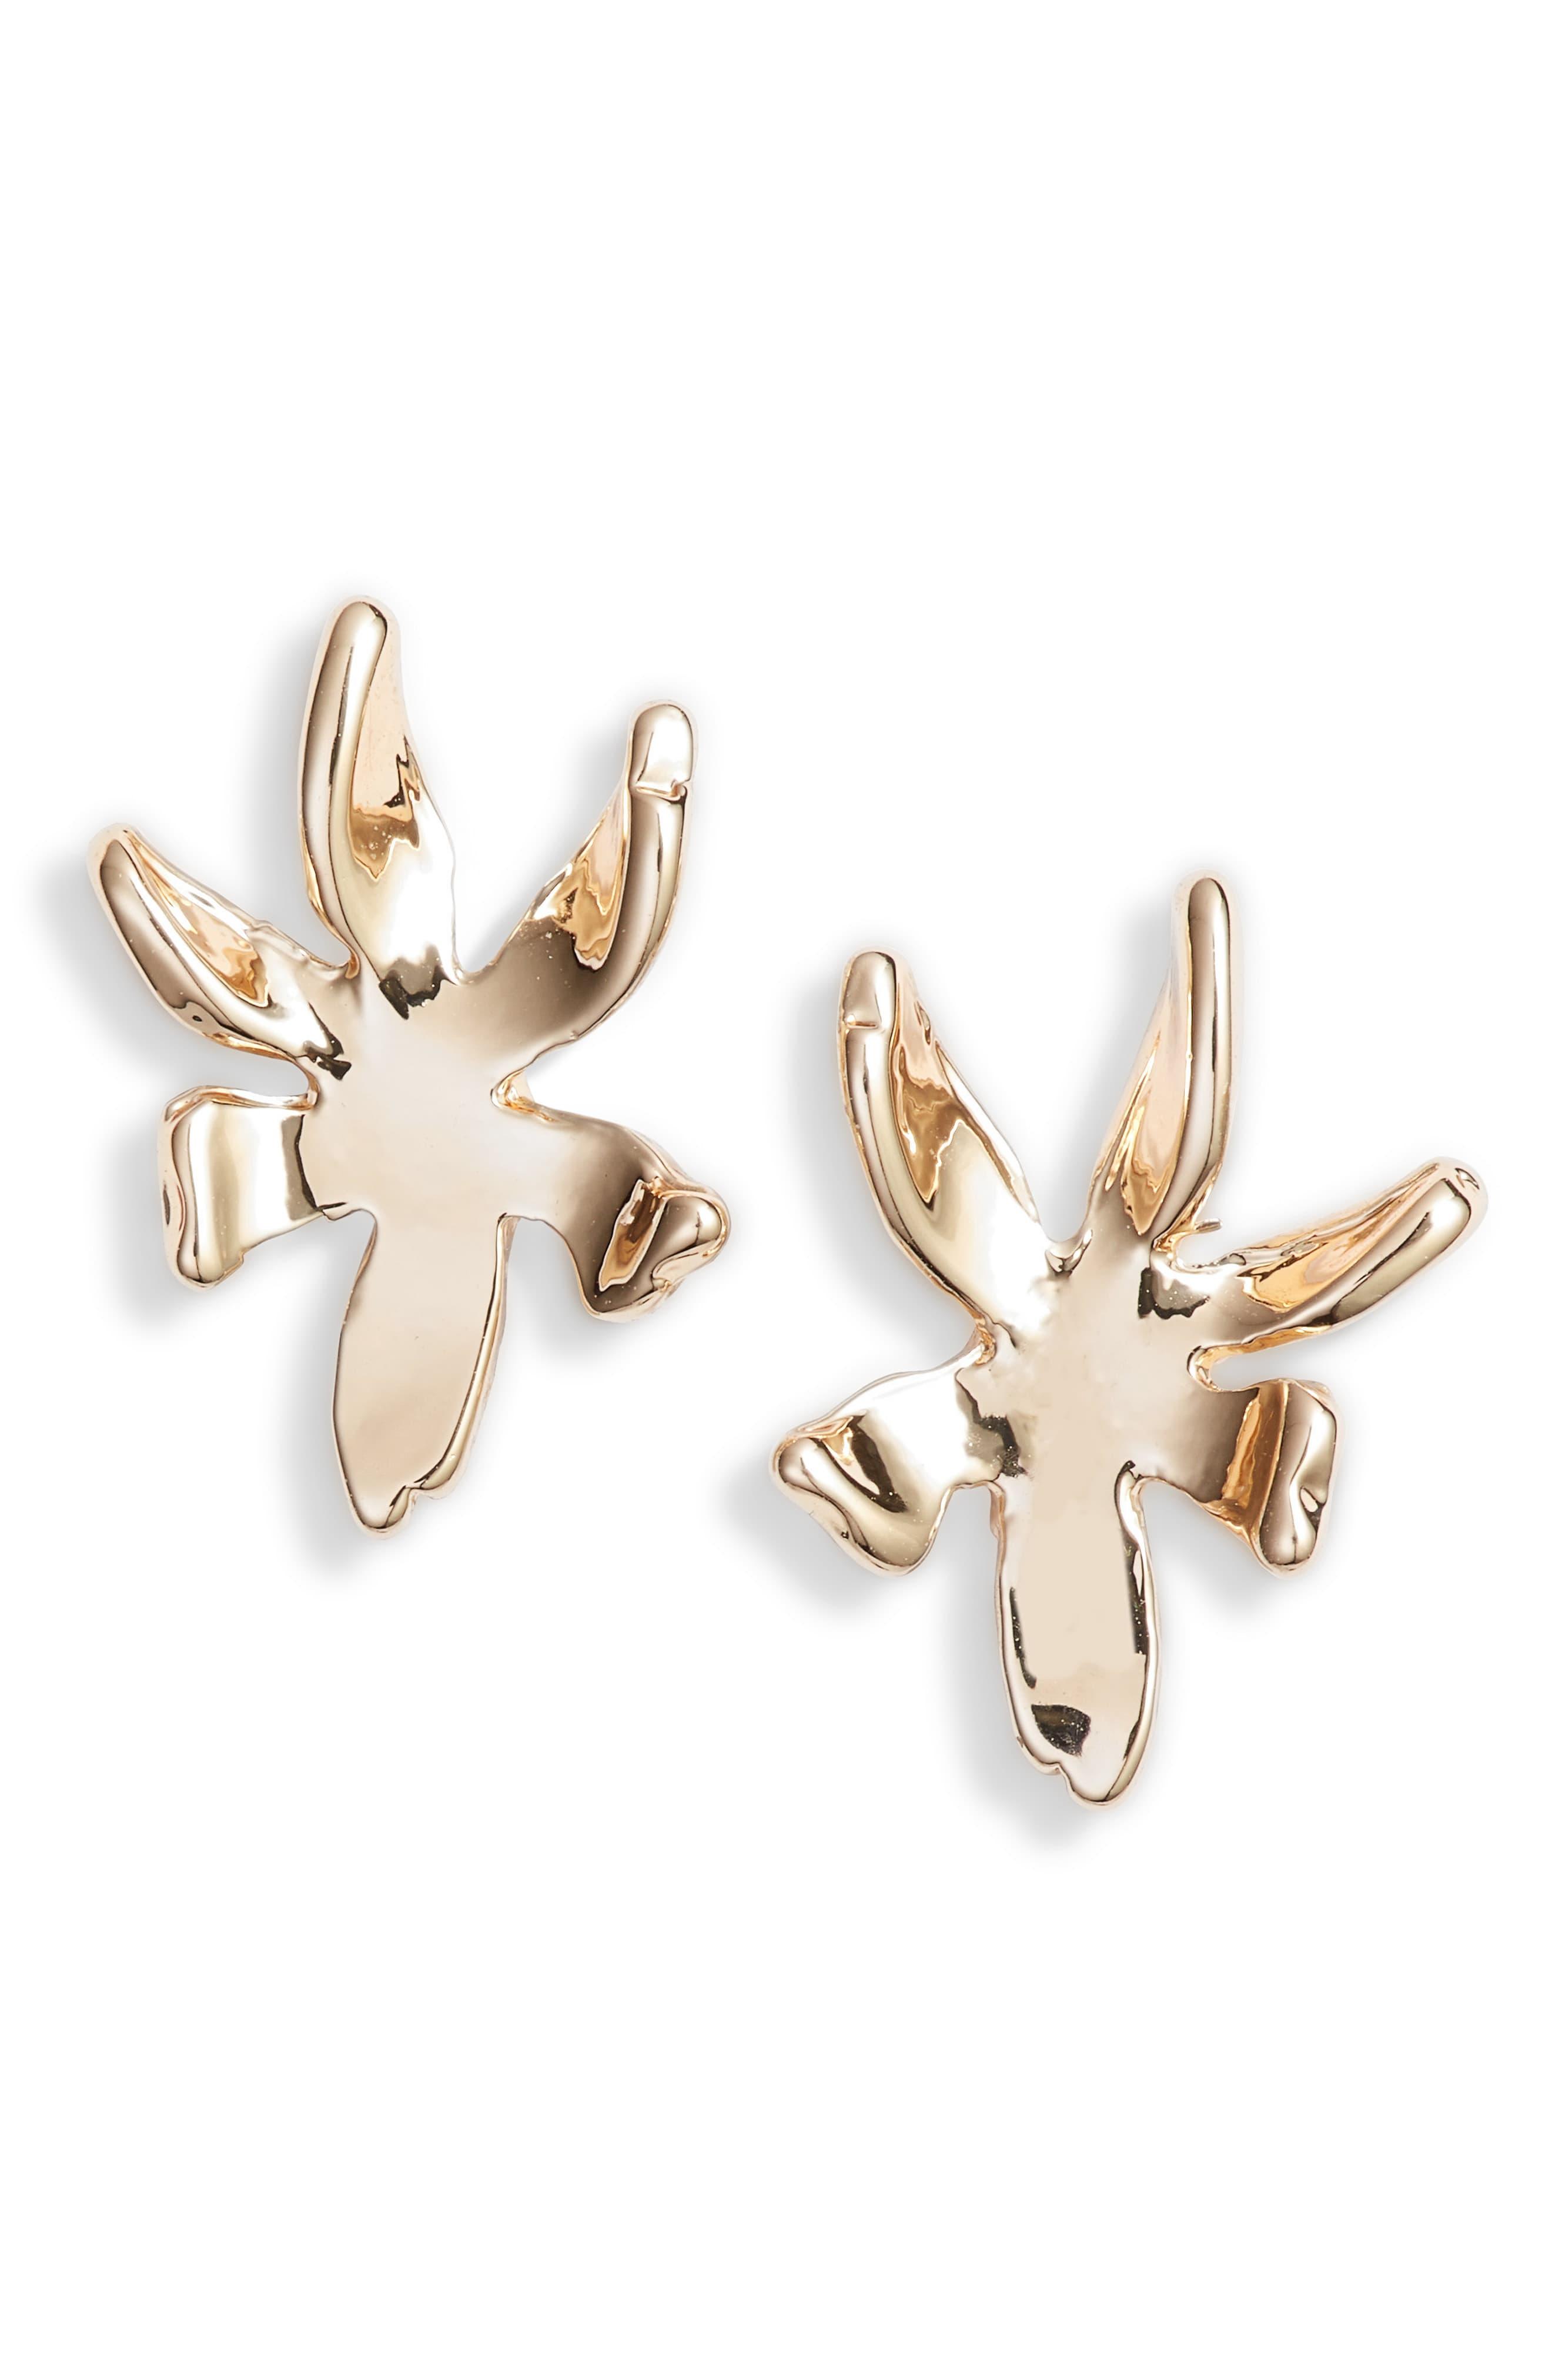 bbe5b87b3 Lele Sadoughi Lily Stud Earrings in 2019 | Products | Earrings, Stud ...